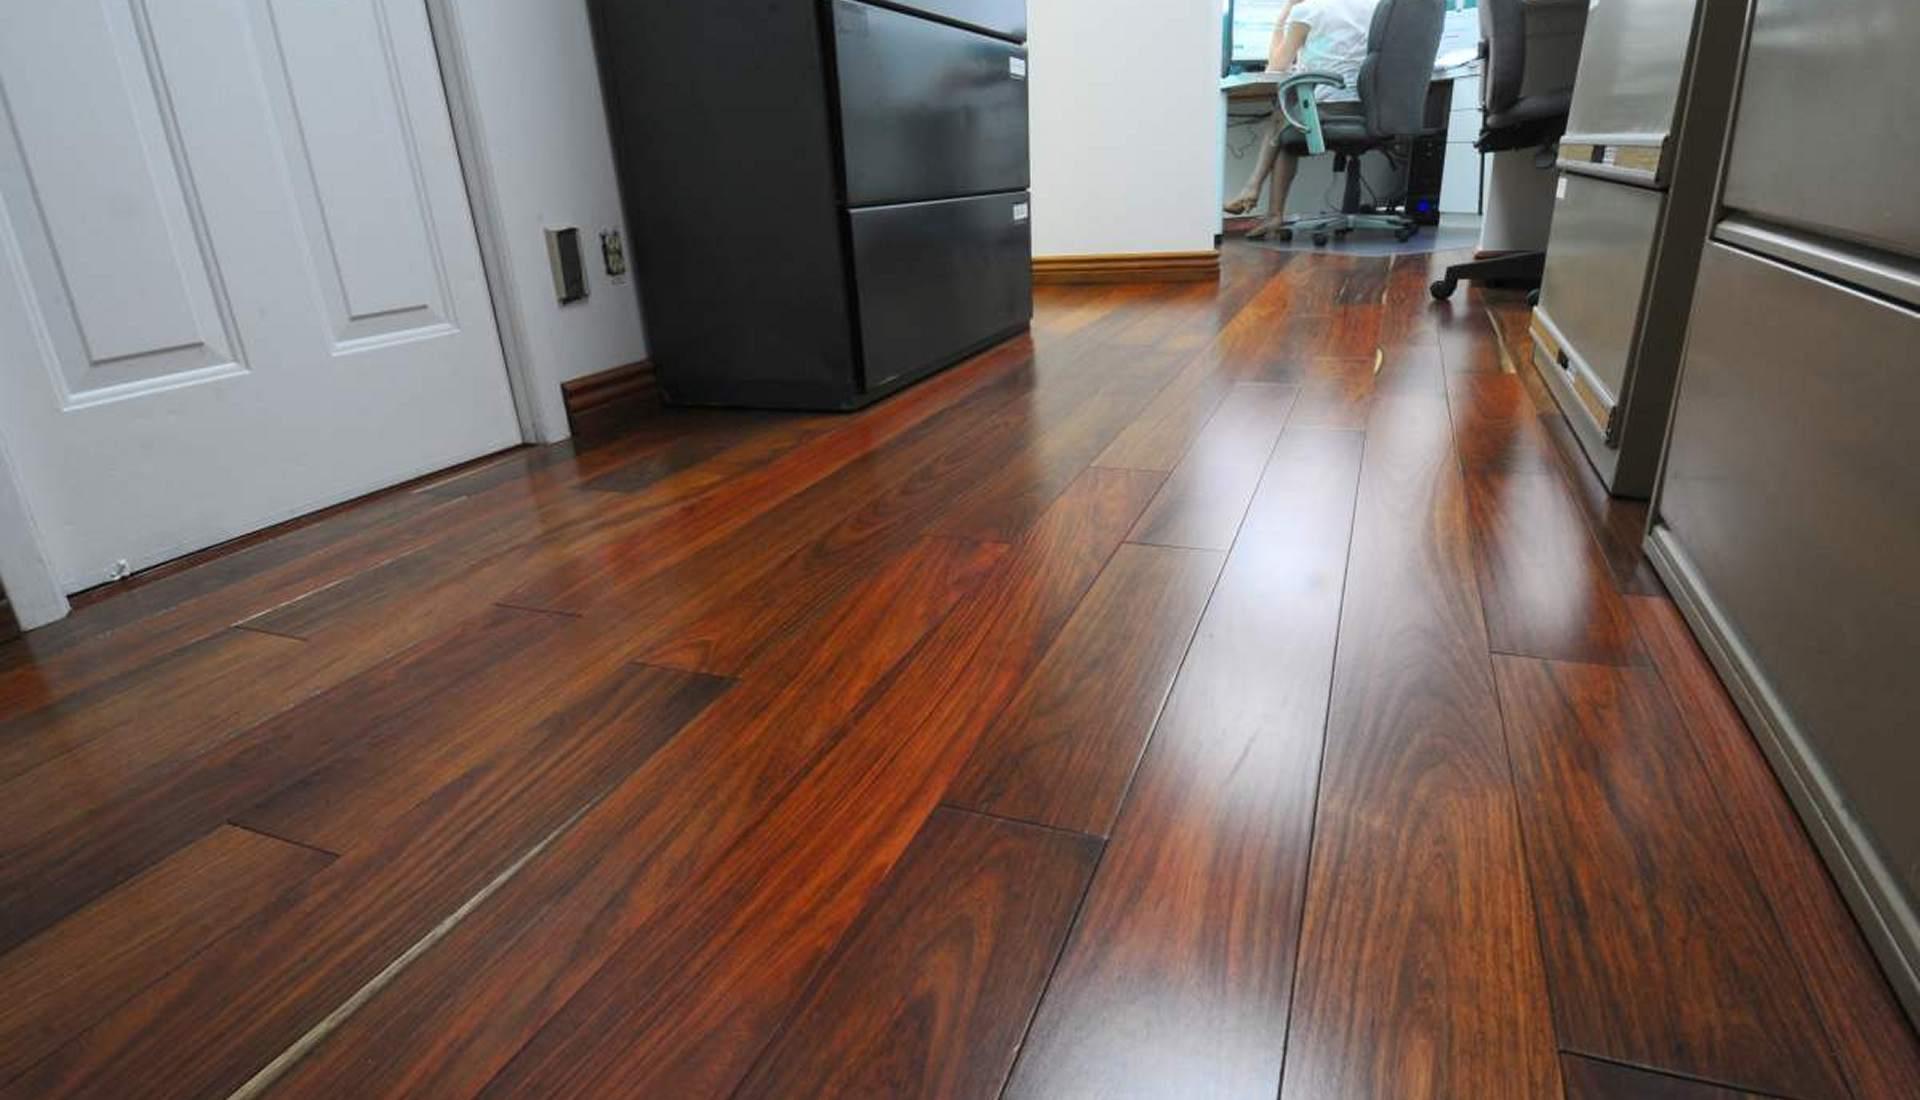 david gilbert plancher standard photos 2. Black Bedroom Furniture Sets. Home Design Ideas